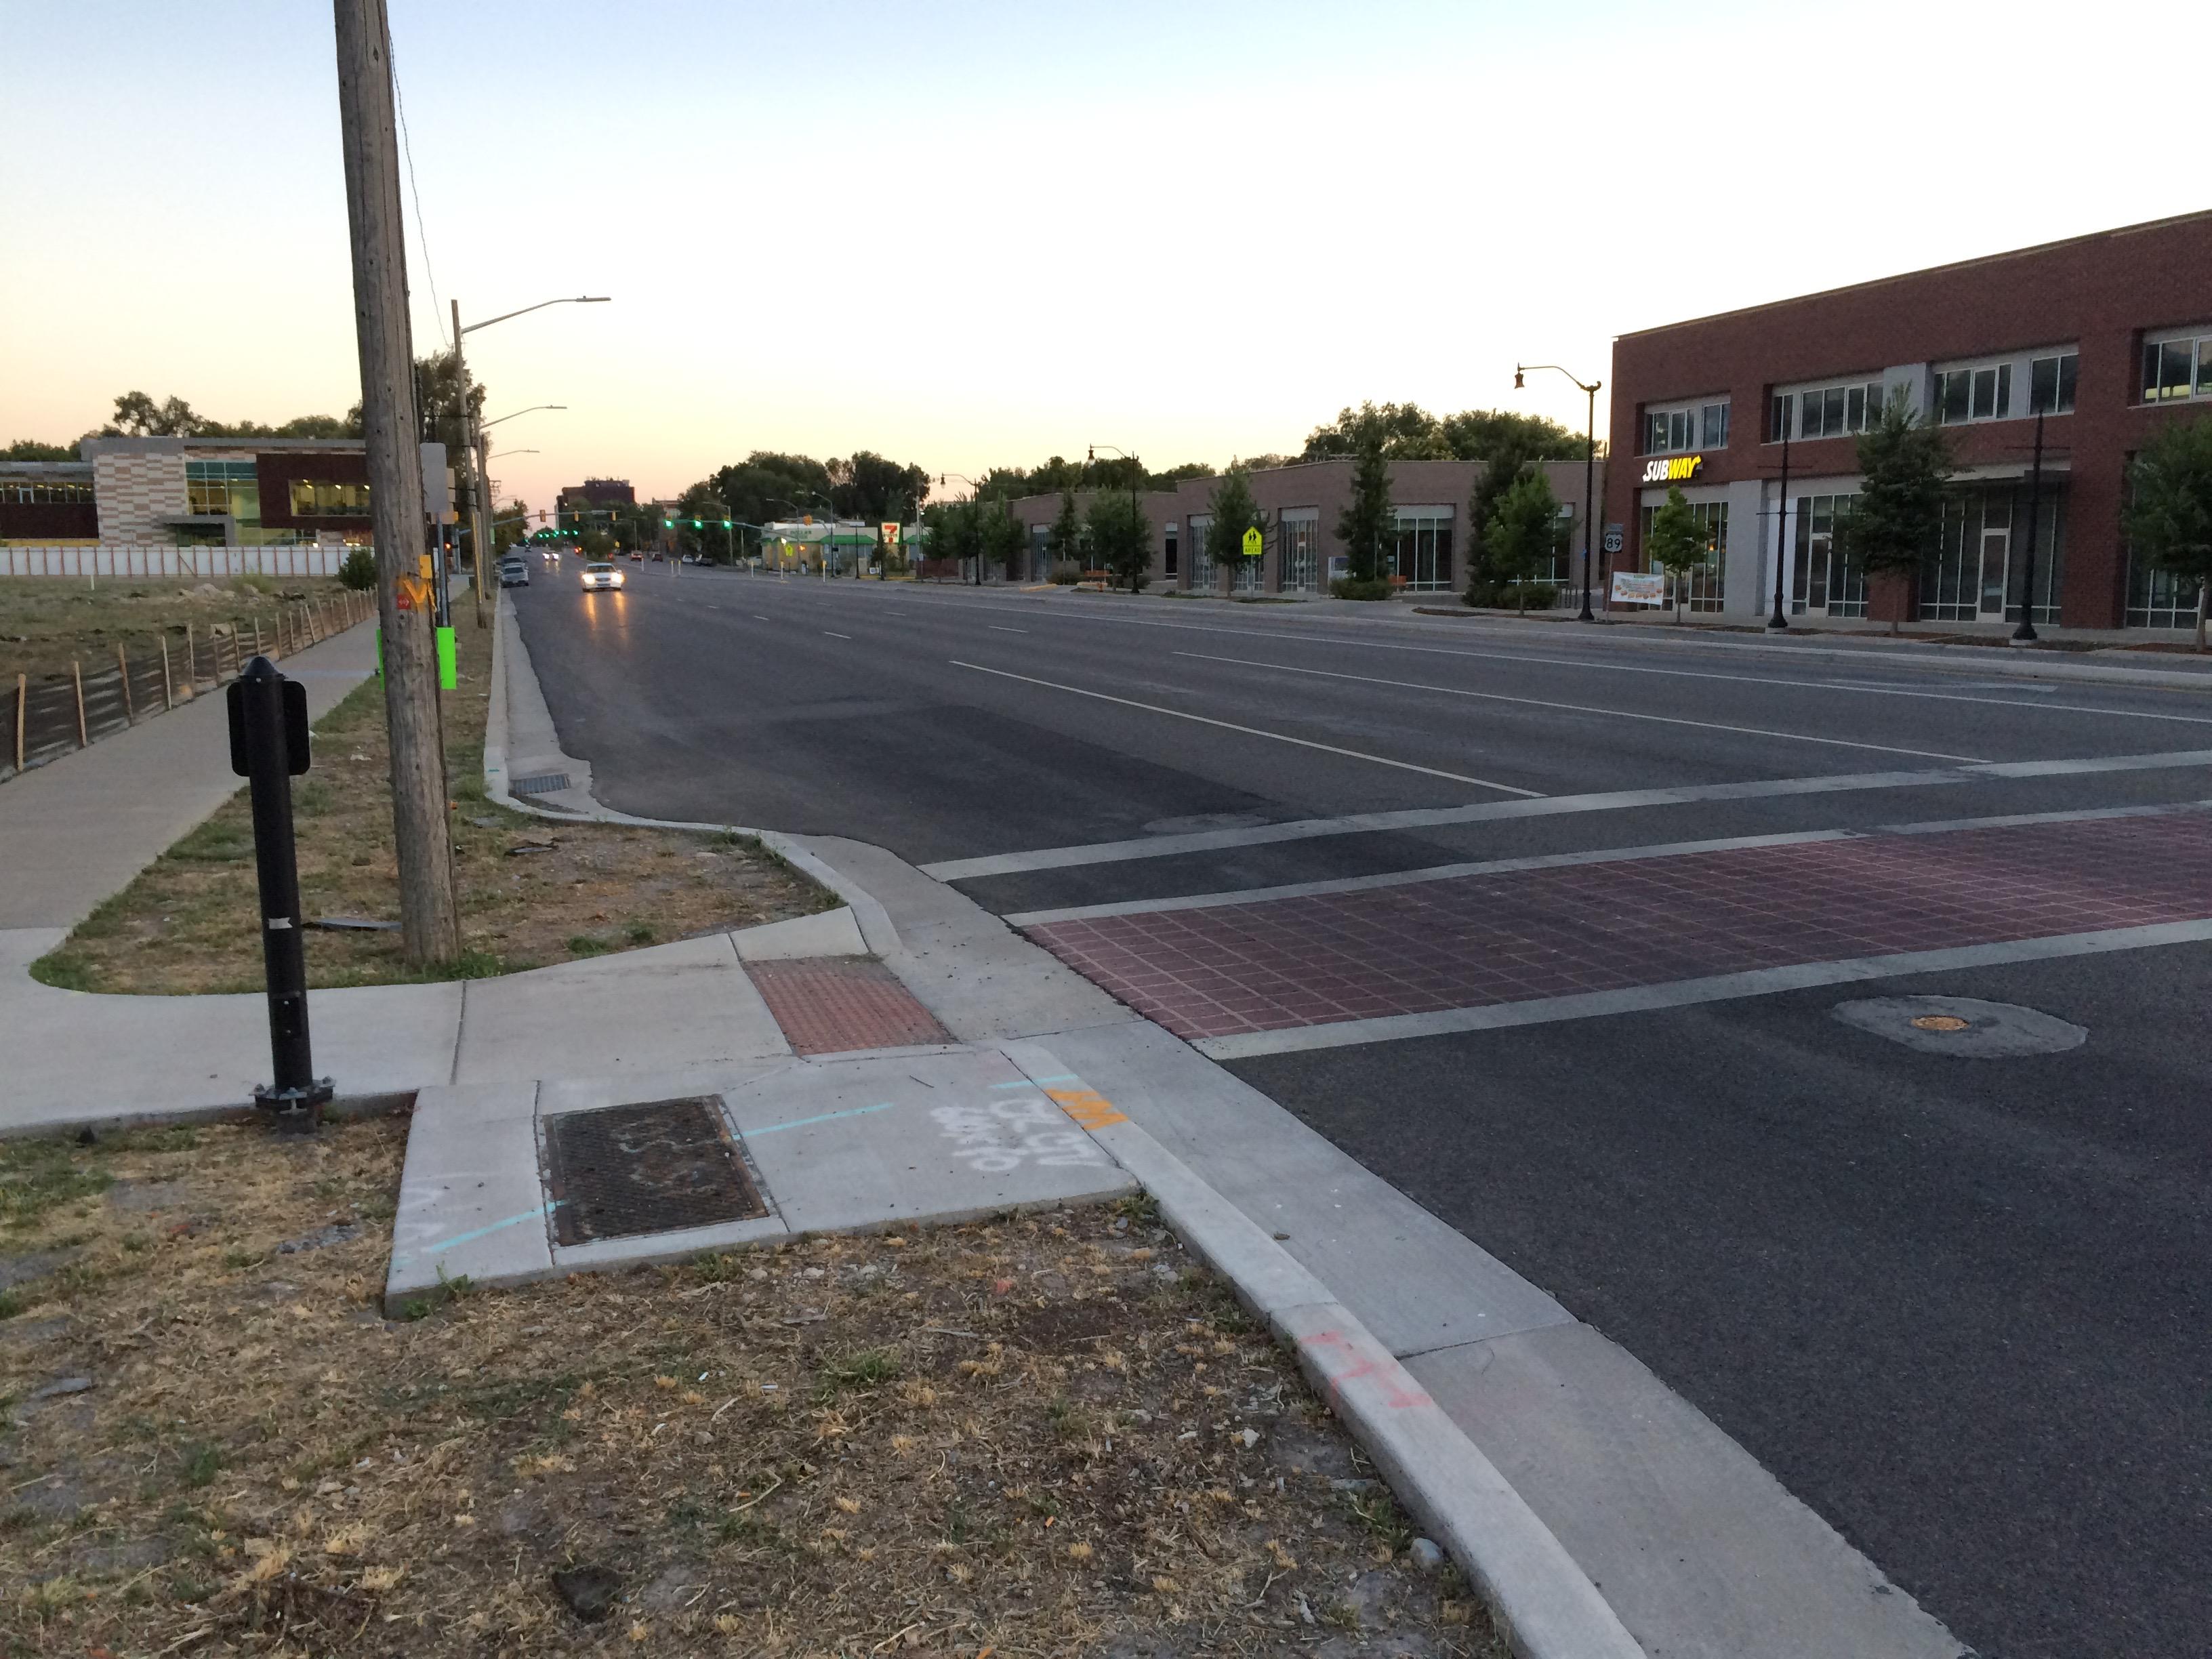 600 North Cycling Salt Lake City IMG_3361